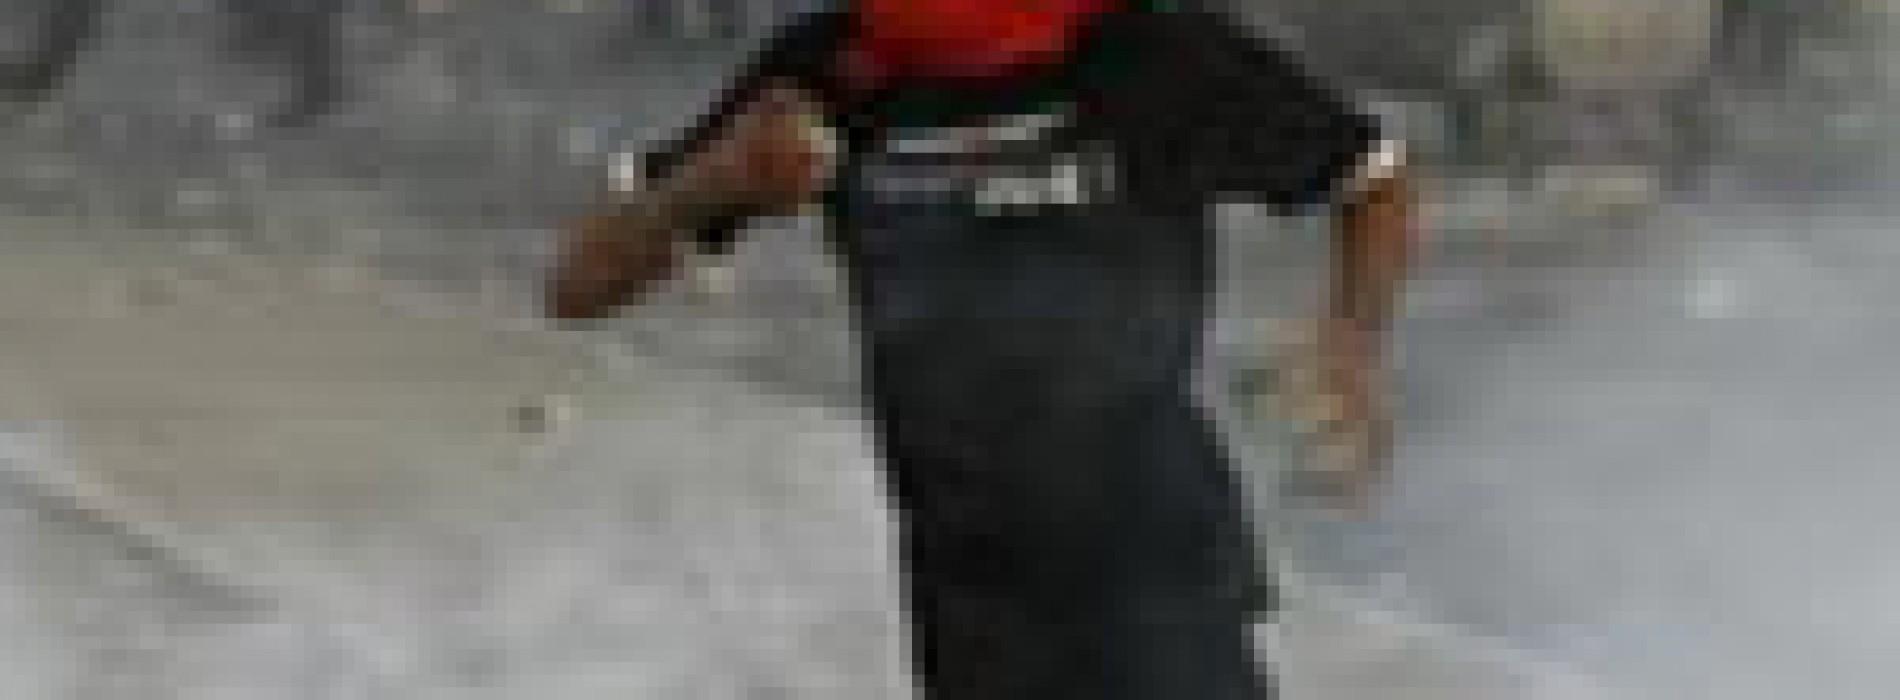 Bahraini Security Forces Sweep Shia Neighborhoods